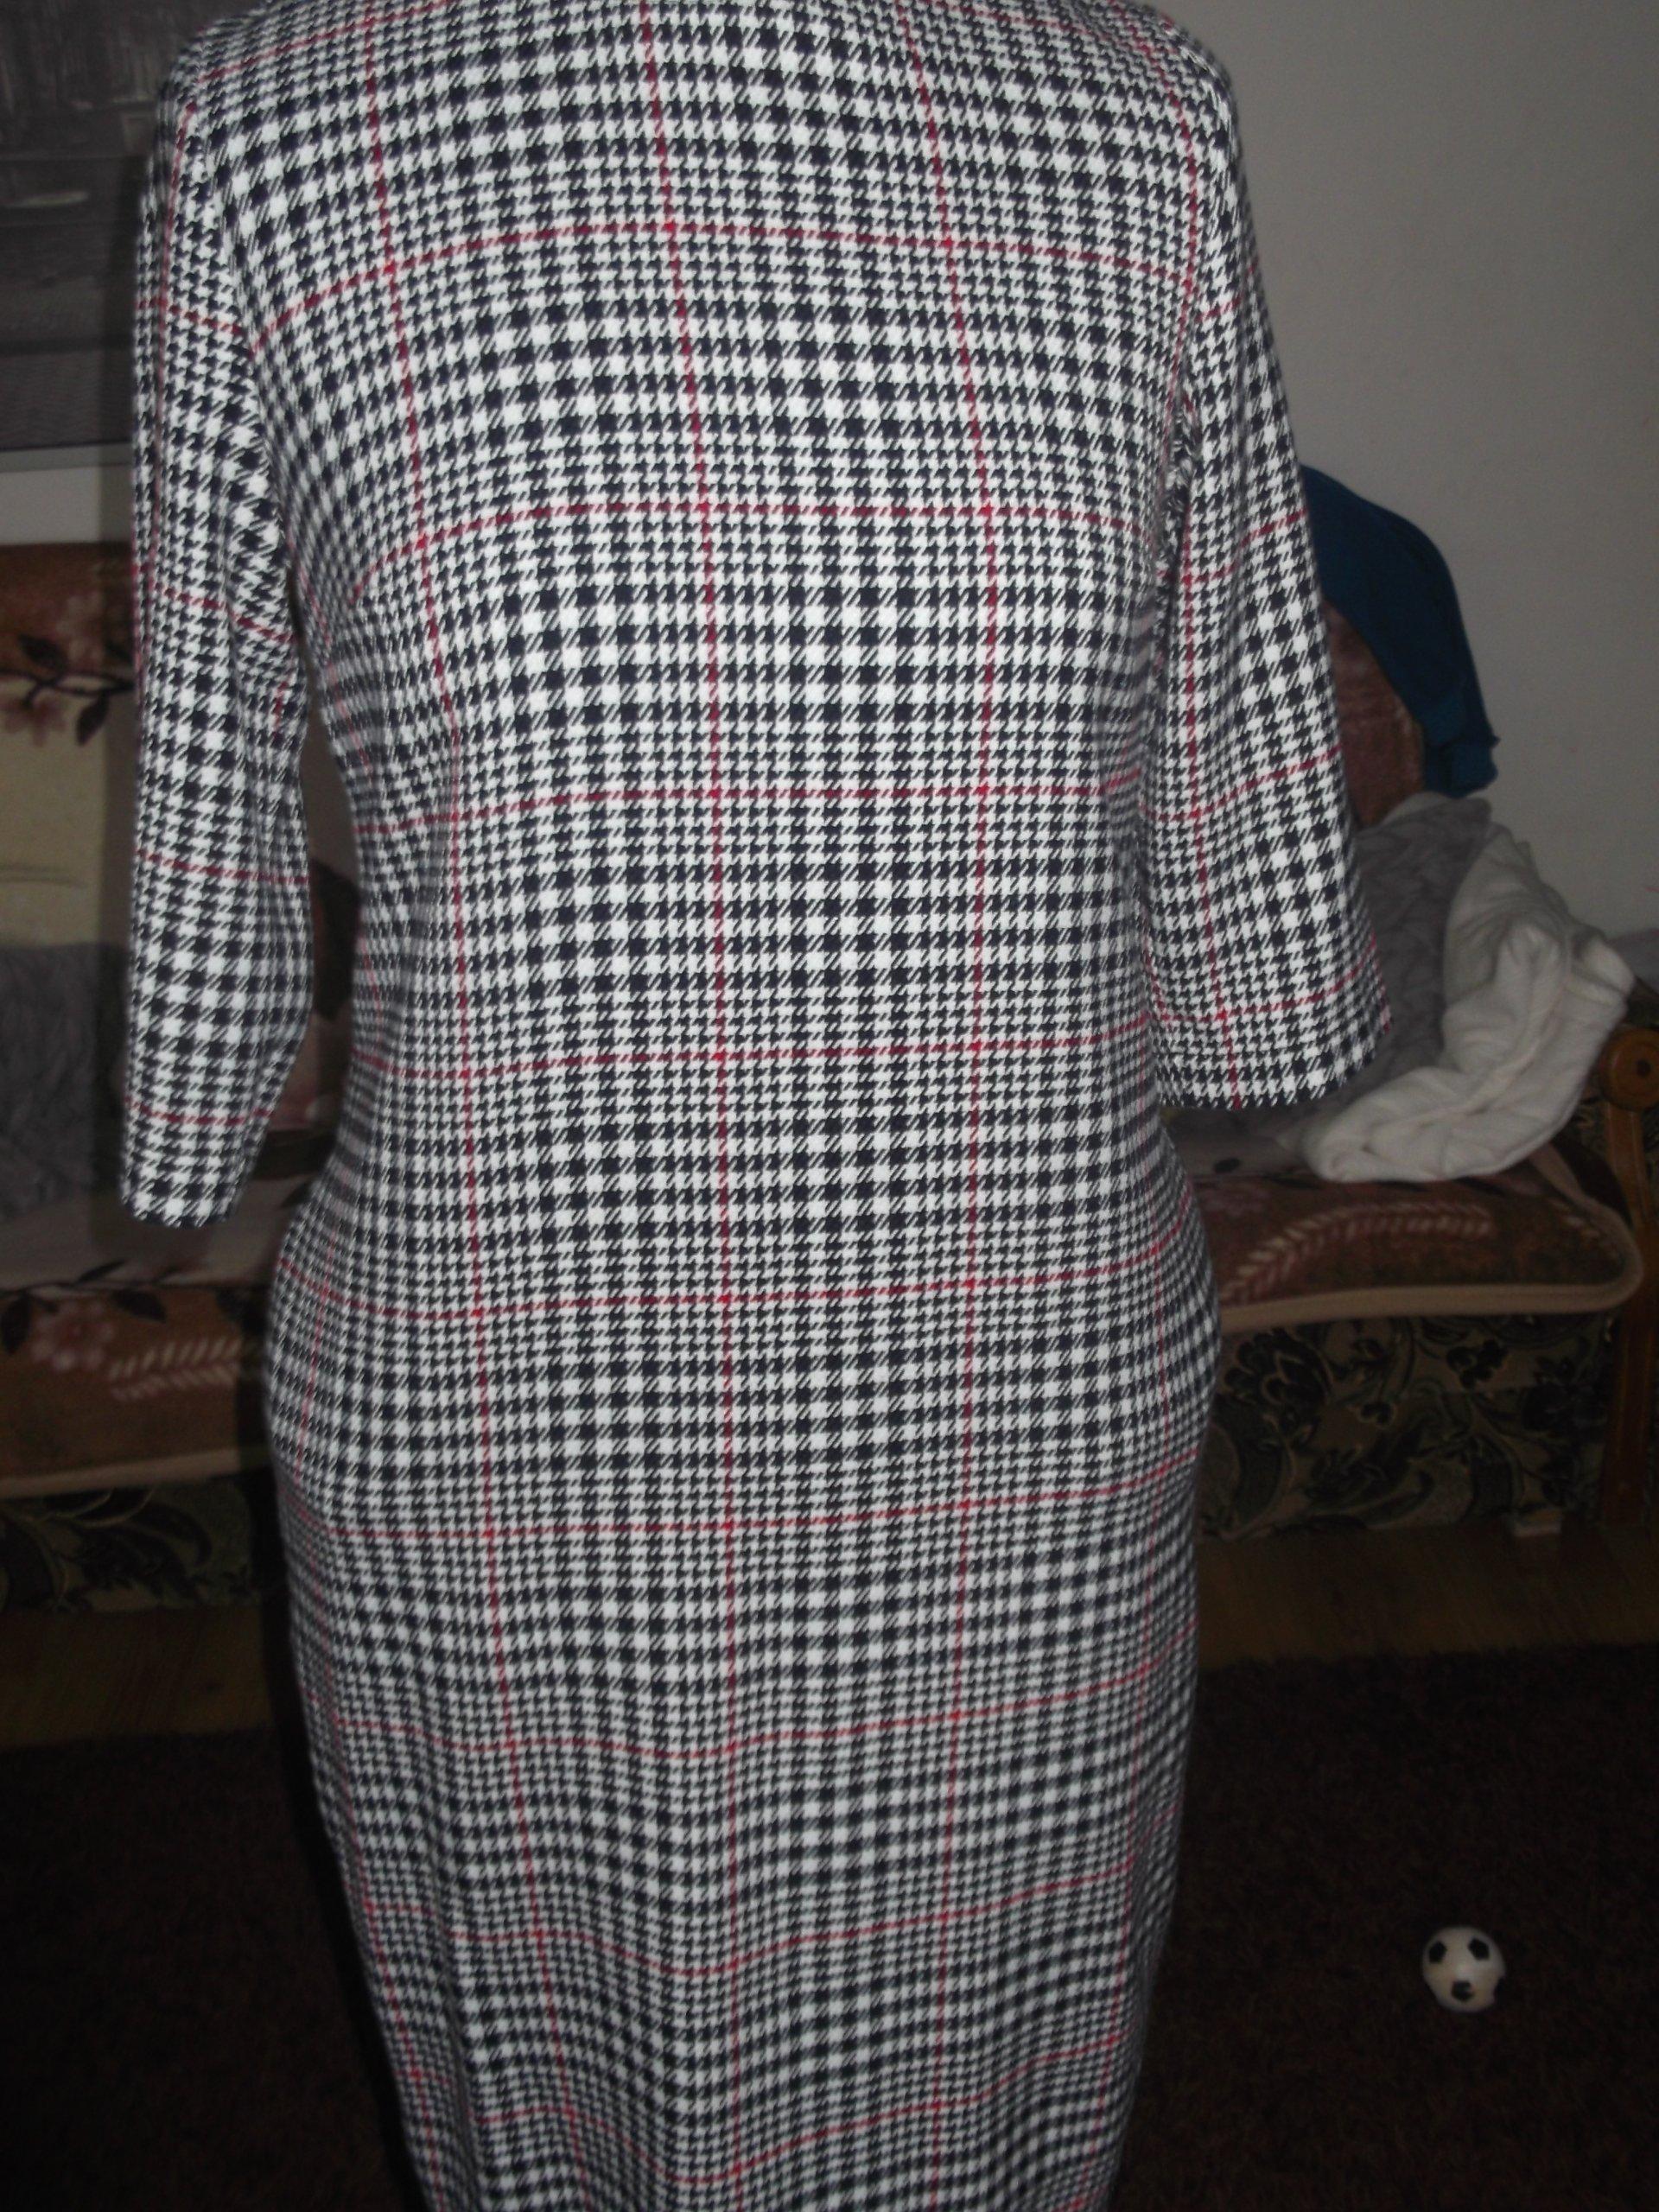 8846c007f6 Sukienka Modern line 38 - 7205940770 - oficjalne archiwum allegro